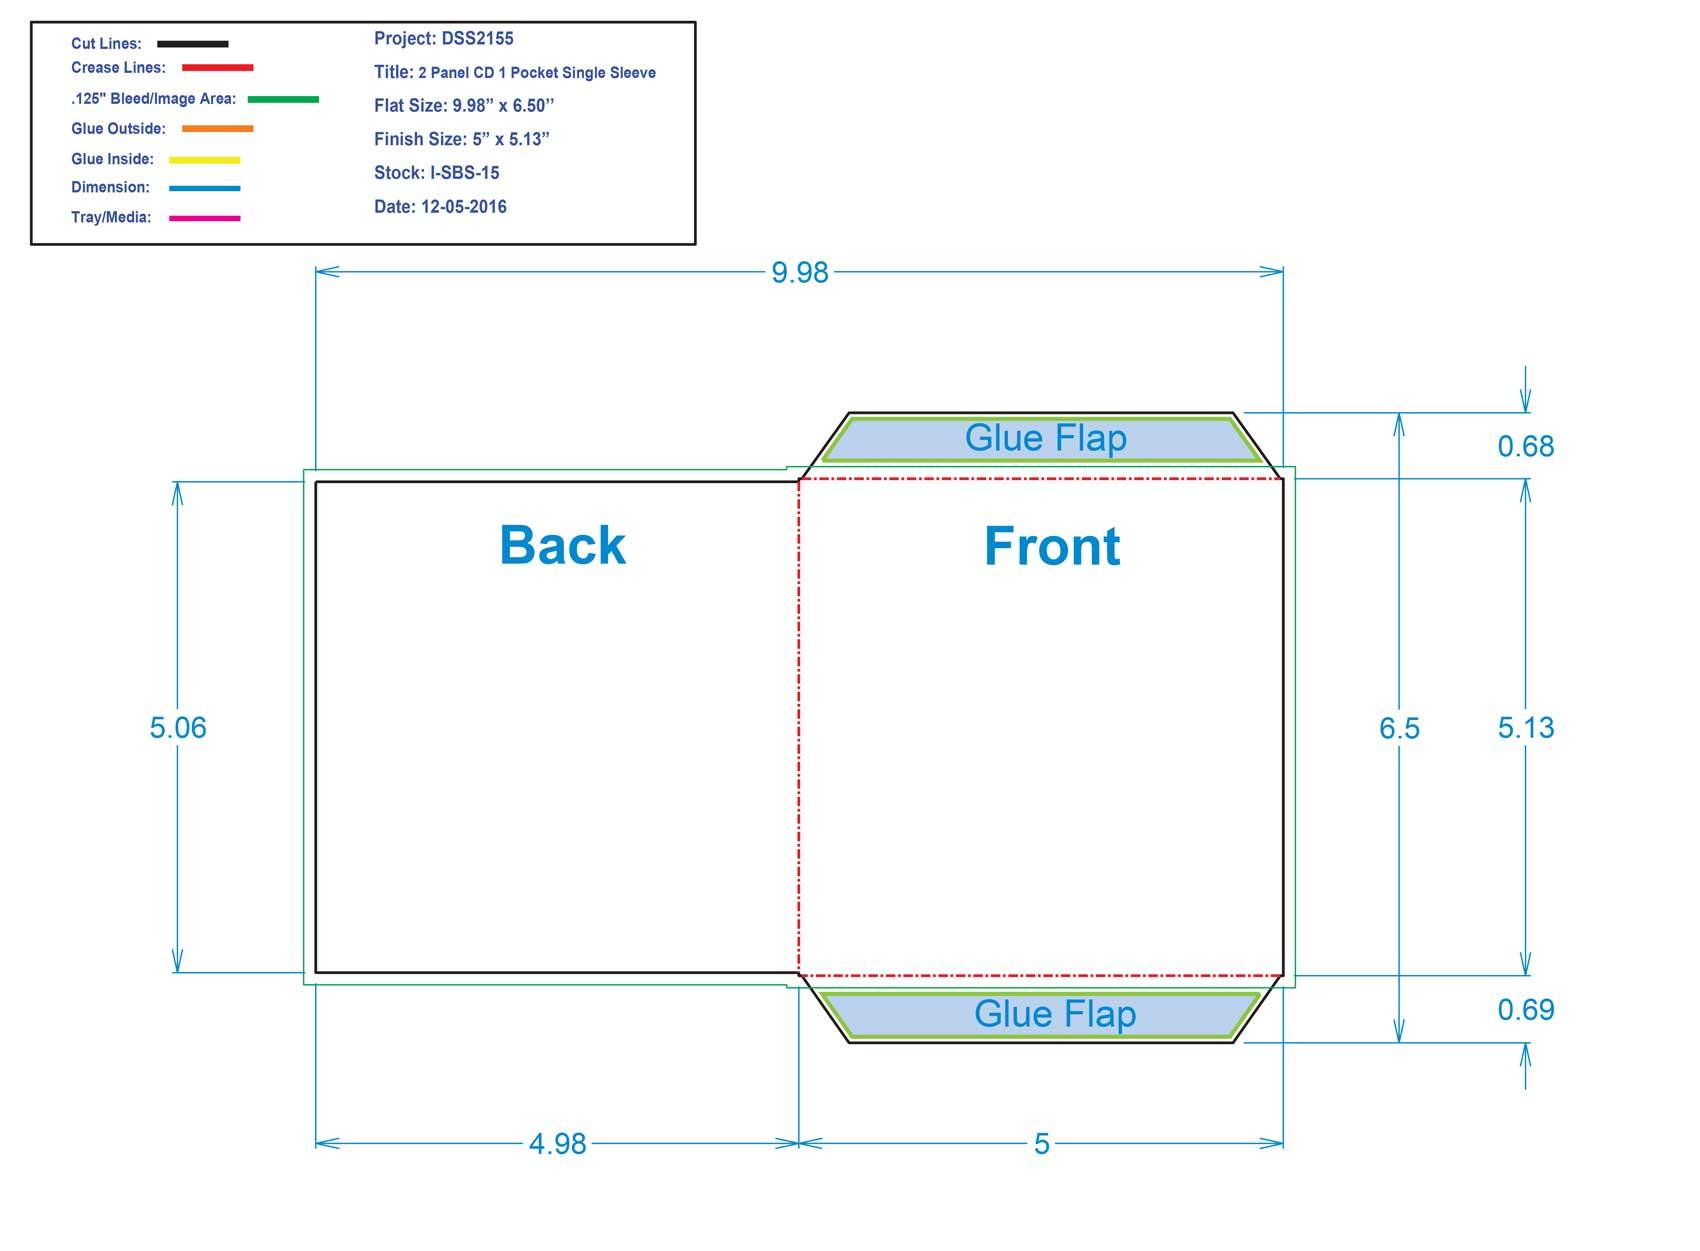 DSS2155 1 Panel CD Single Sleeve